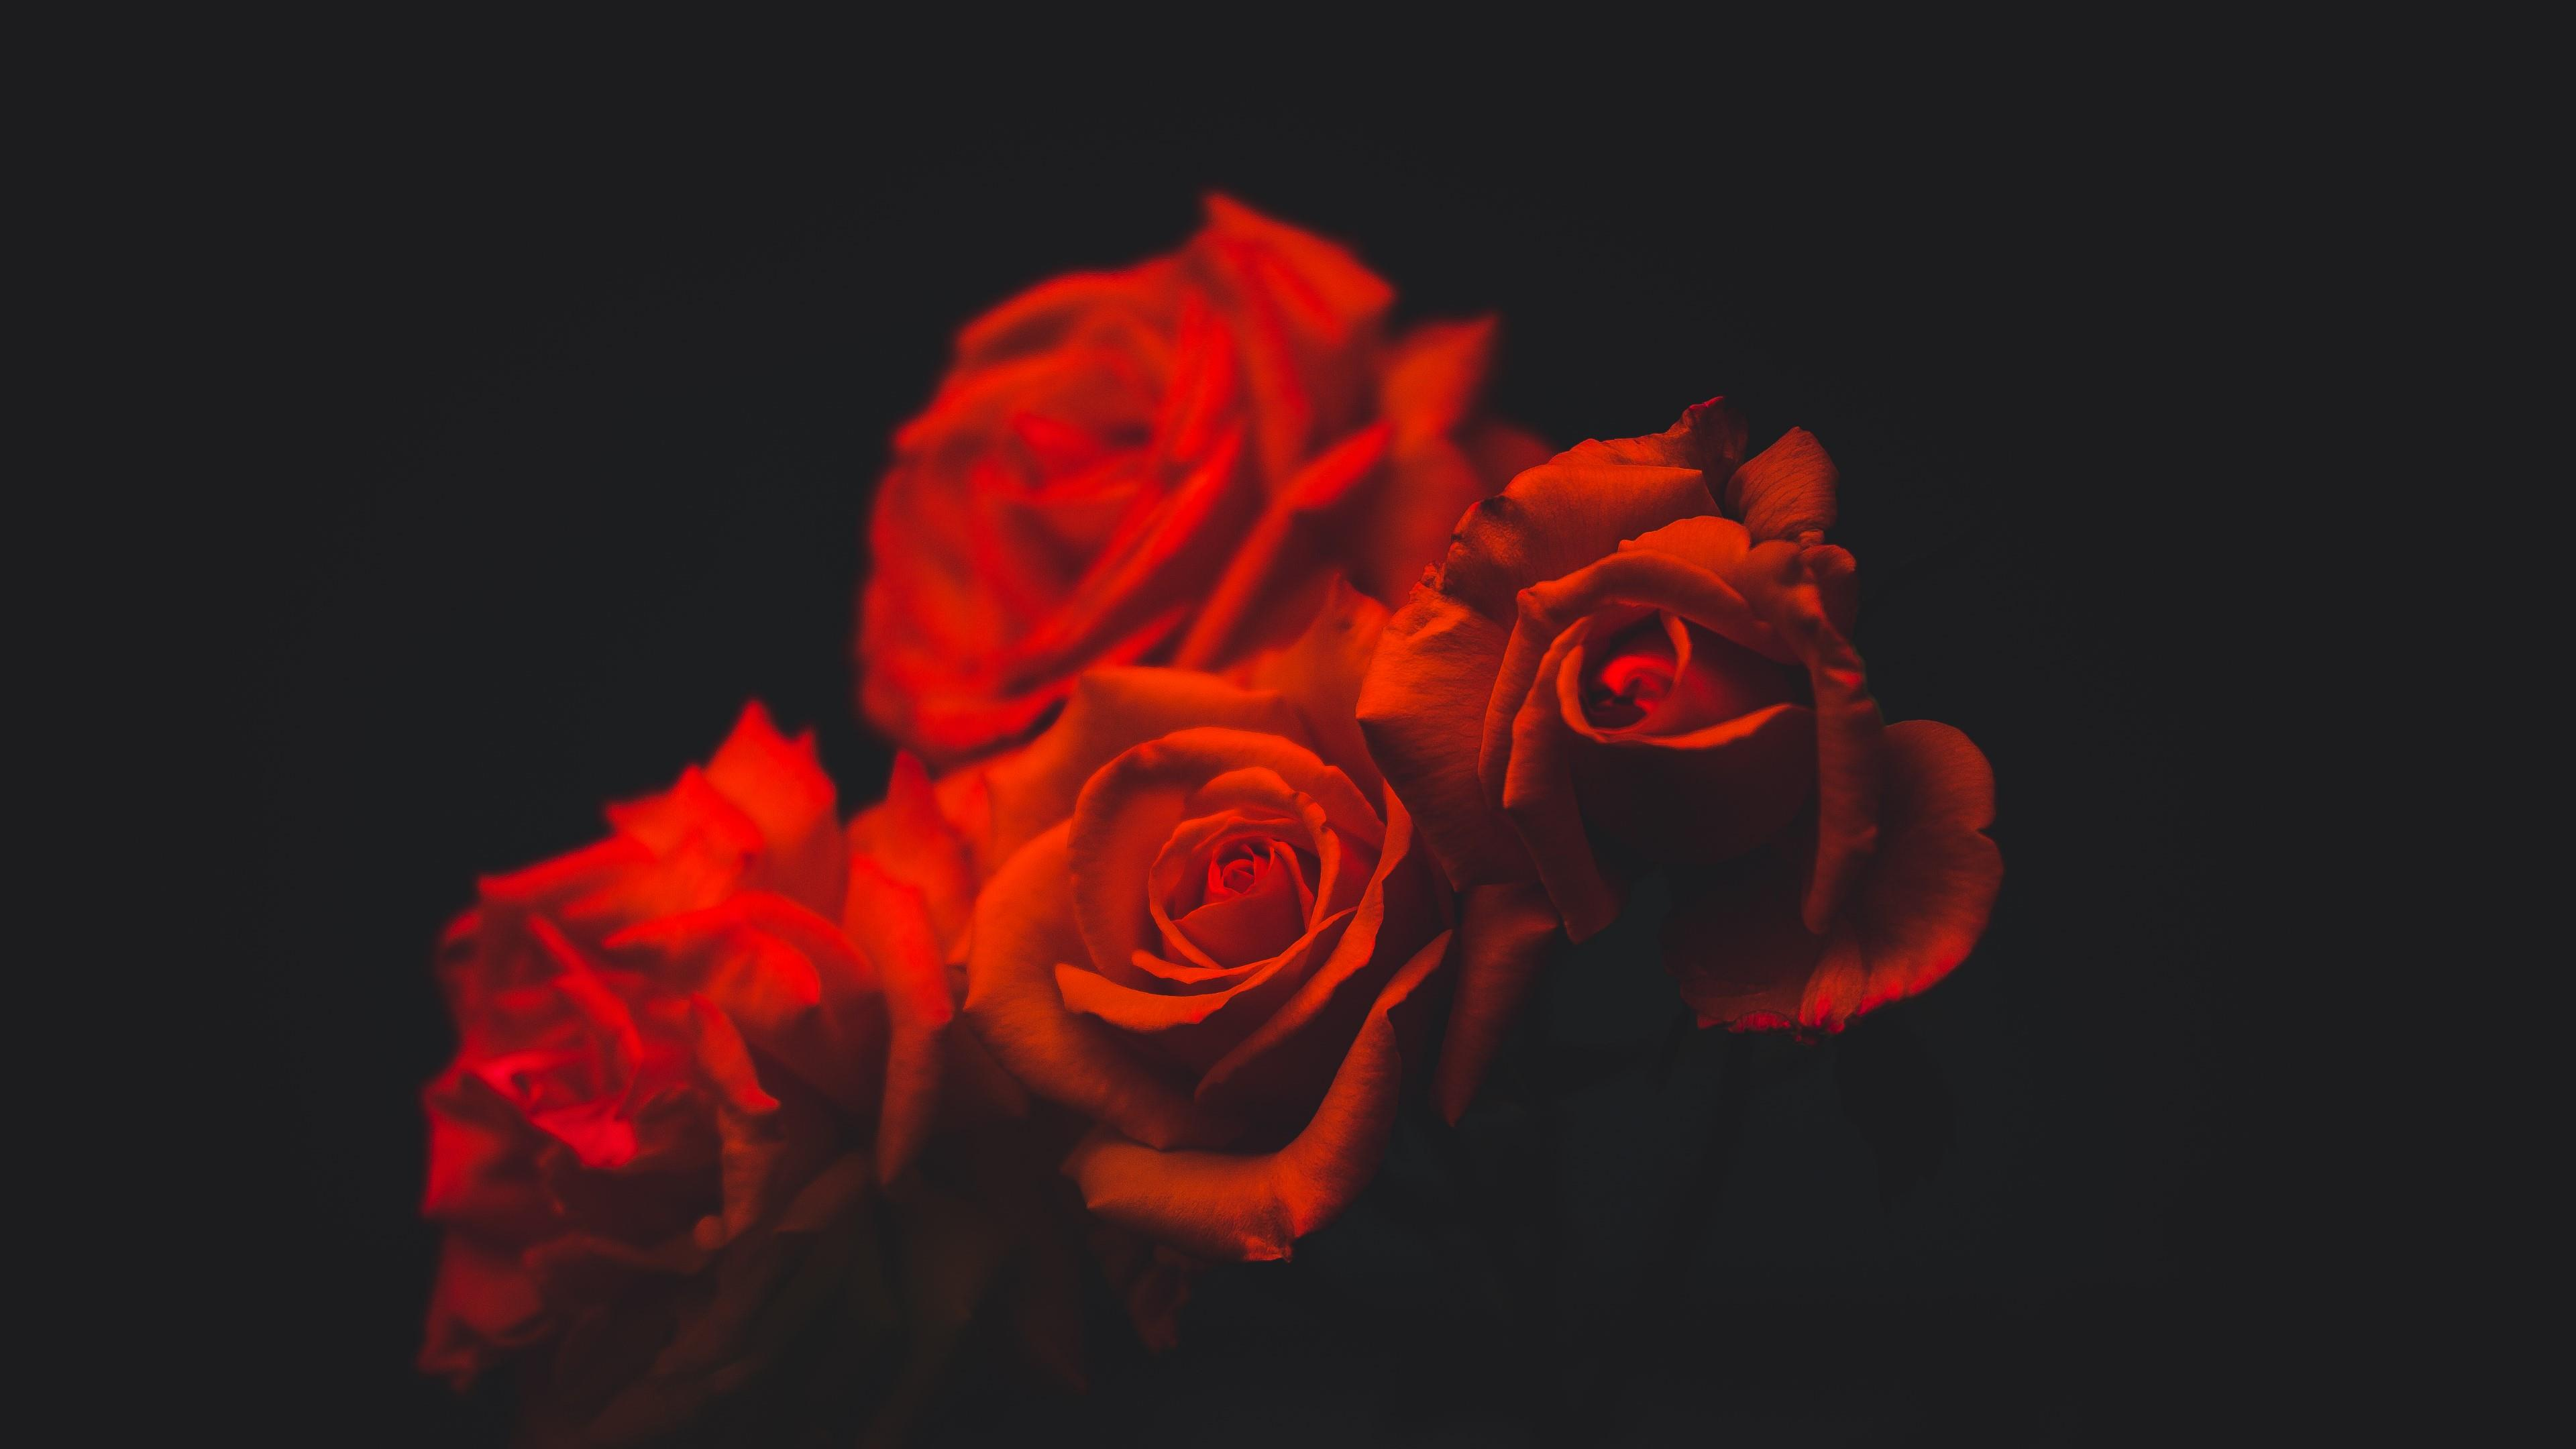 Red rose bouquet wallpaper